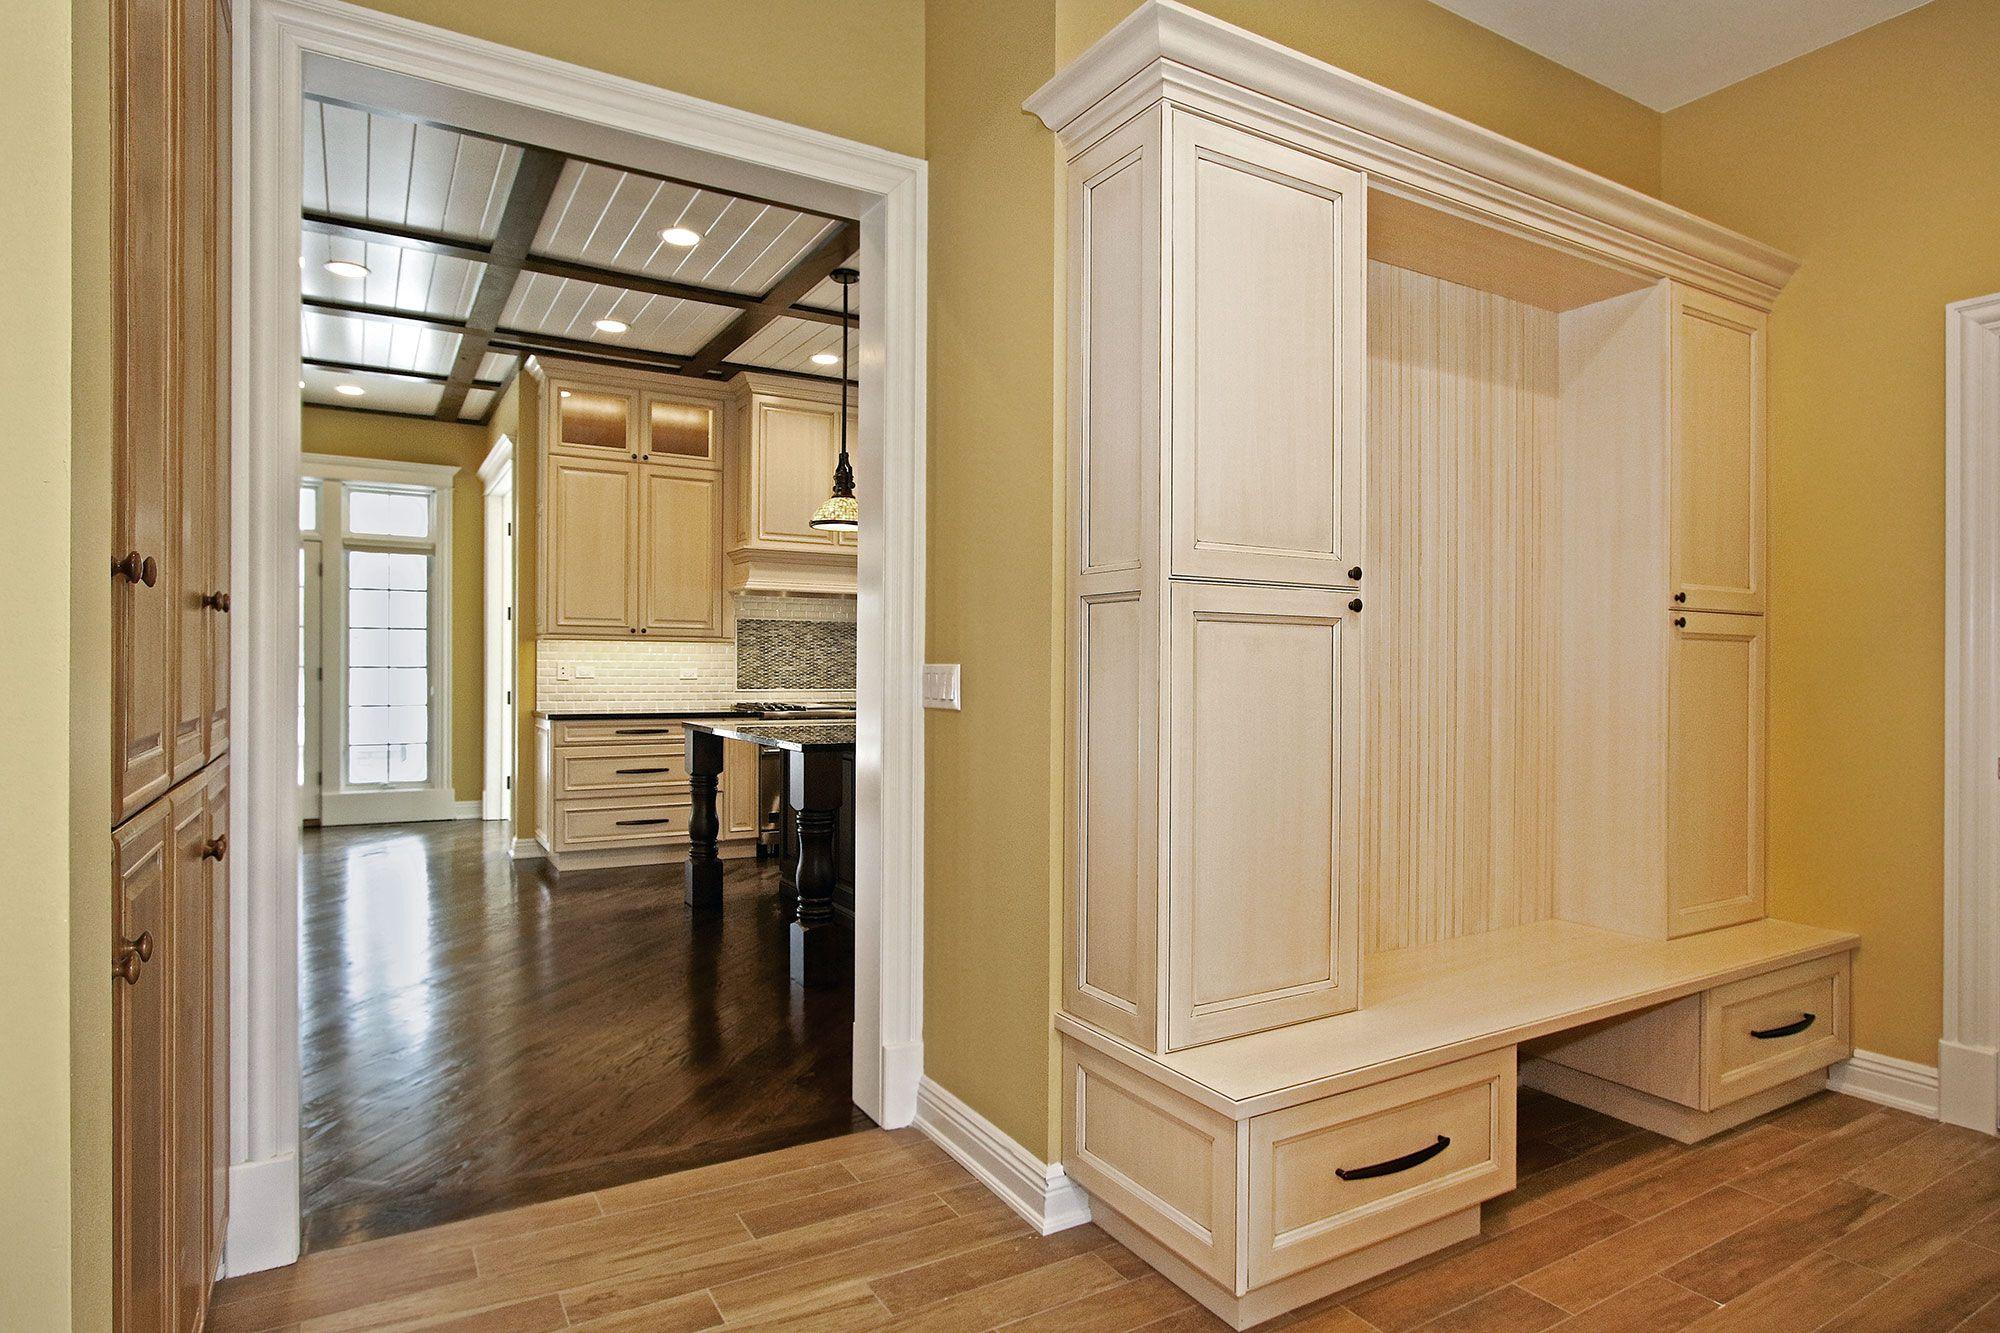 maple Slideshow | Kitchen Cabinets & Bathroom Vanity ... on Bathroom Ideas With Maple Cabinets  id=97099